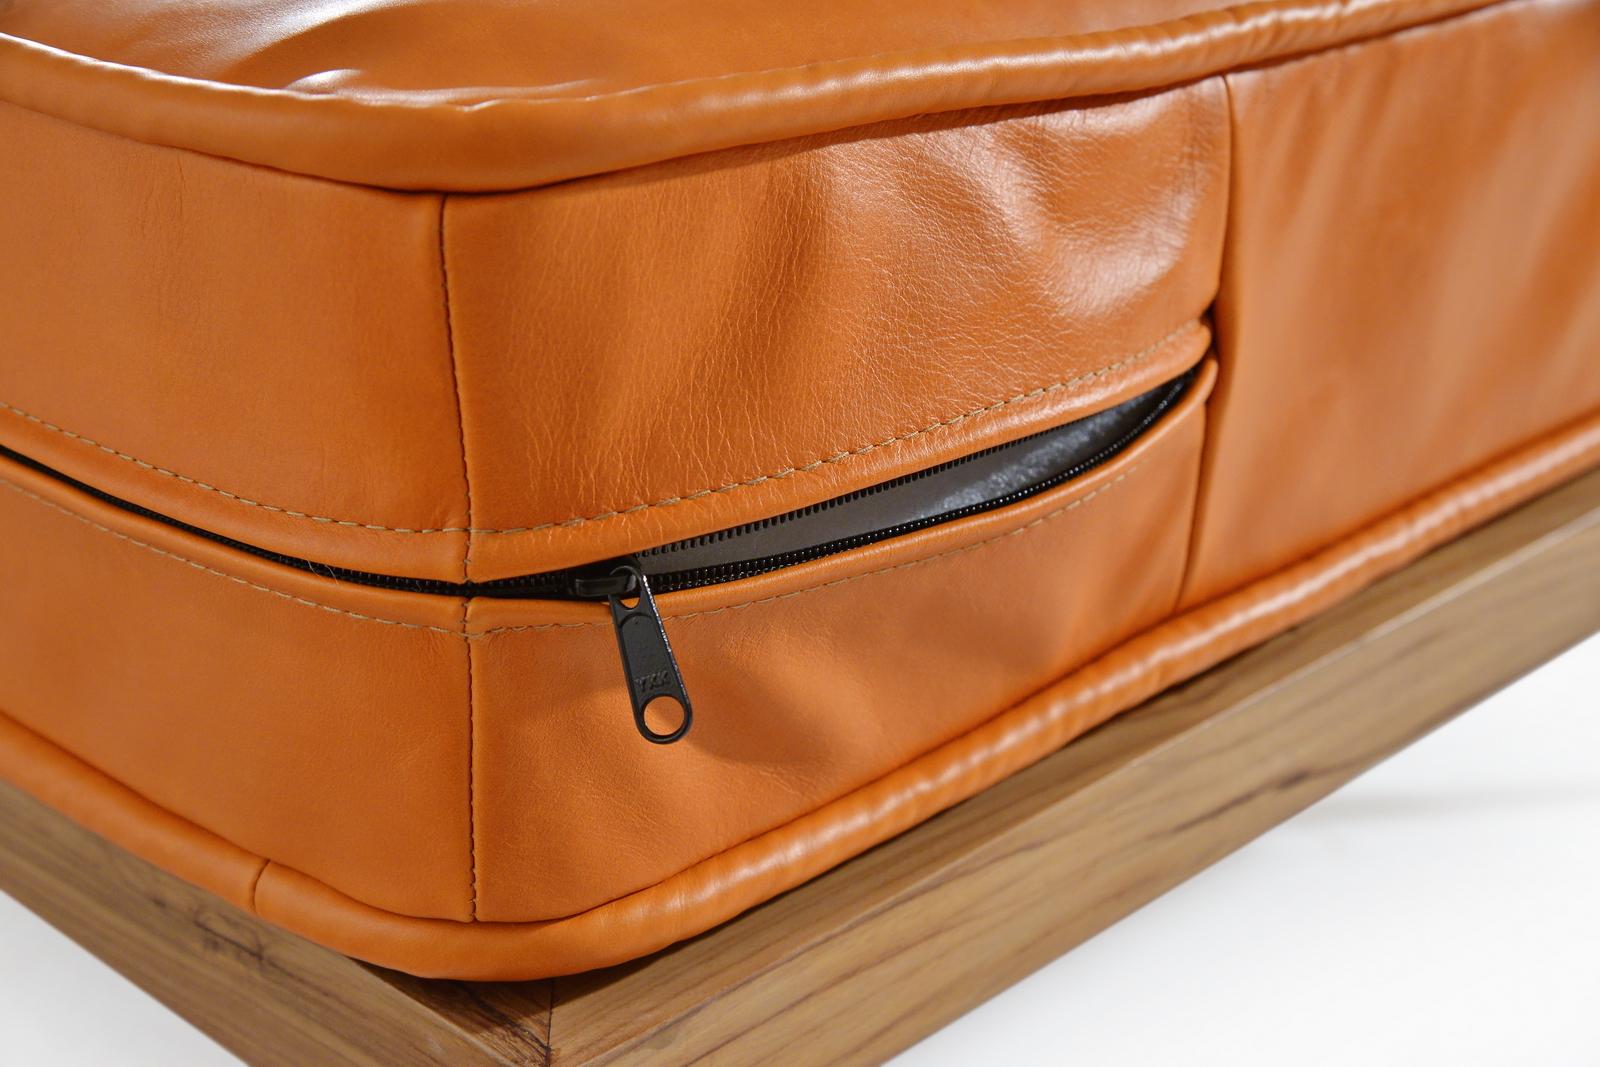 PTendercool-Sofa Corner-BS3-TE-BL-NO-Leather-210623-17